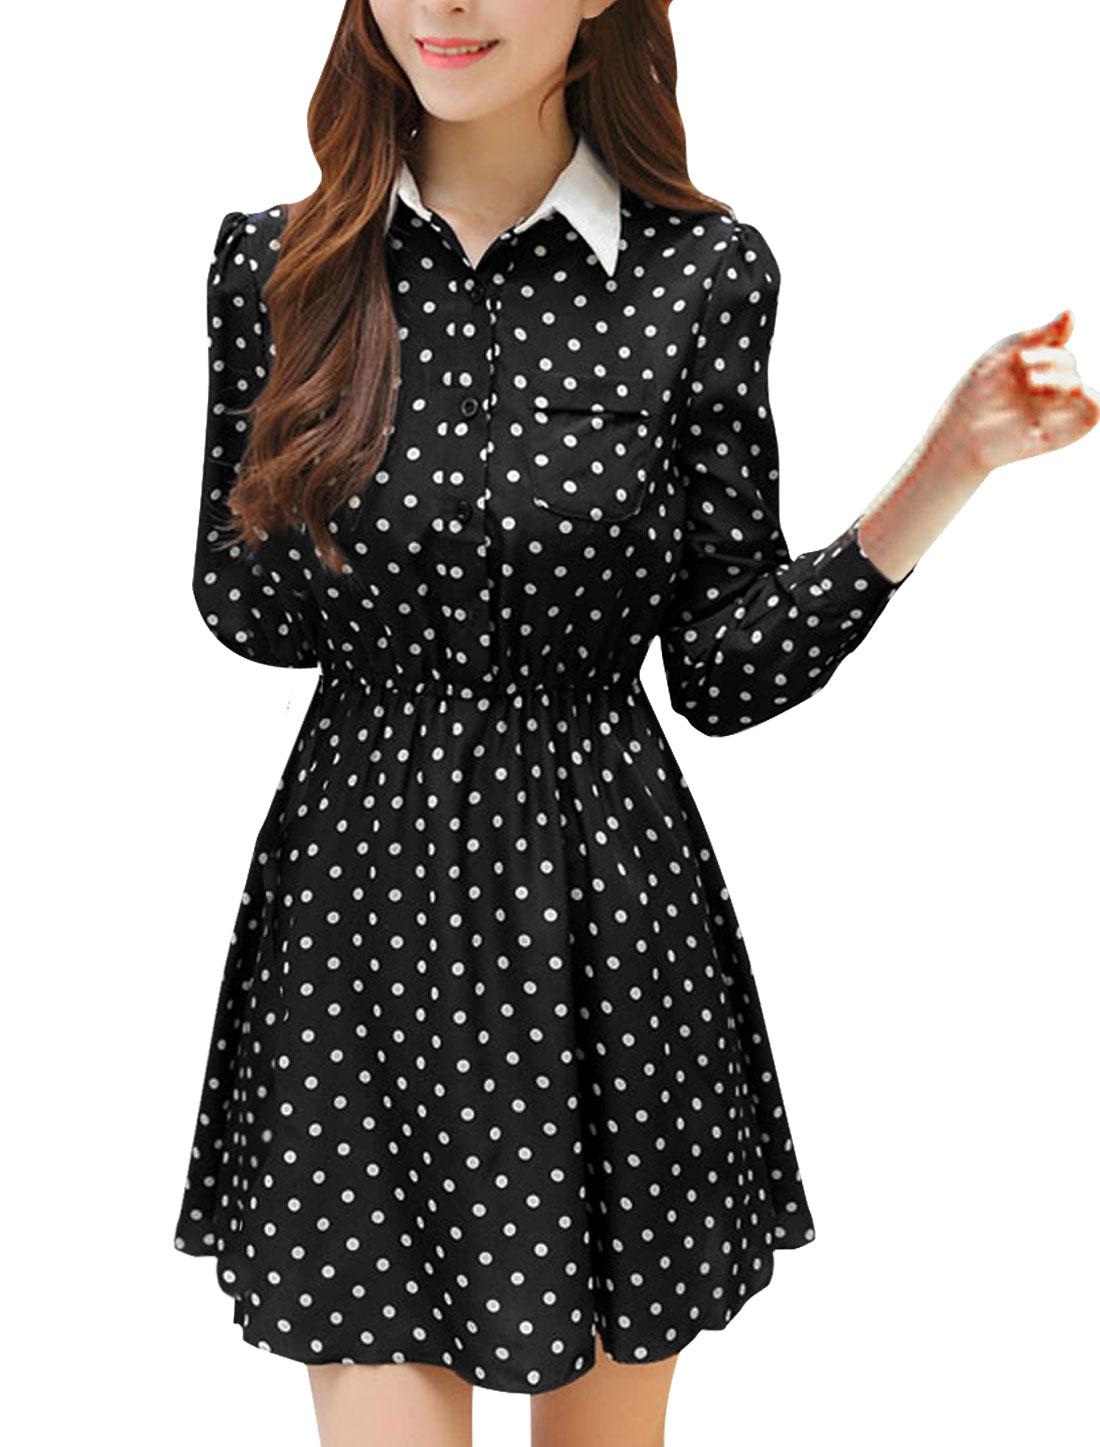 Woman Point Collar Half Placket Dots Prints Shirt Dress Black XS